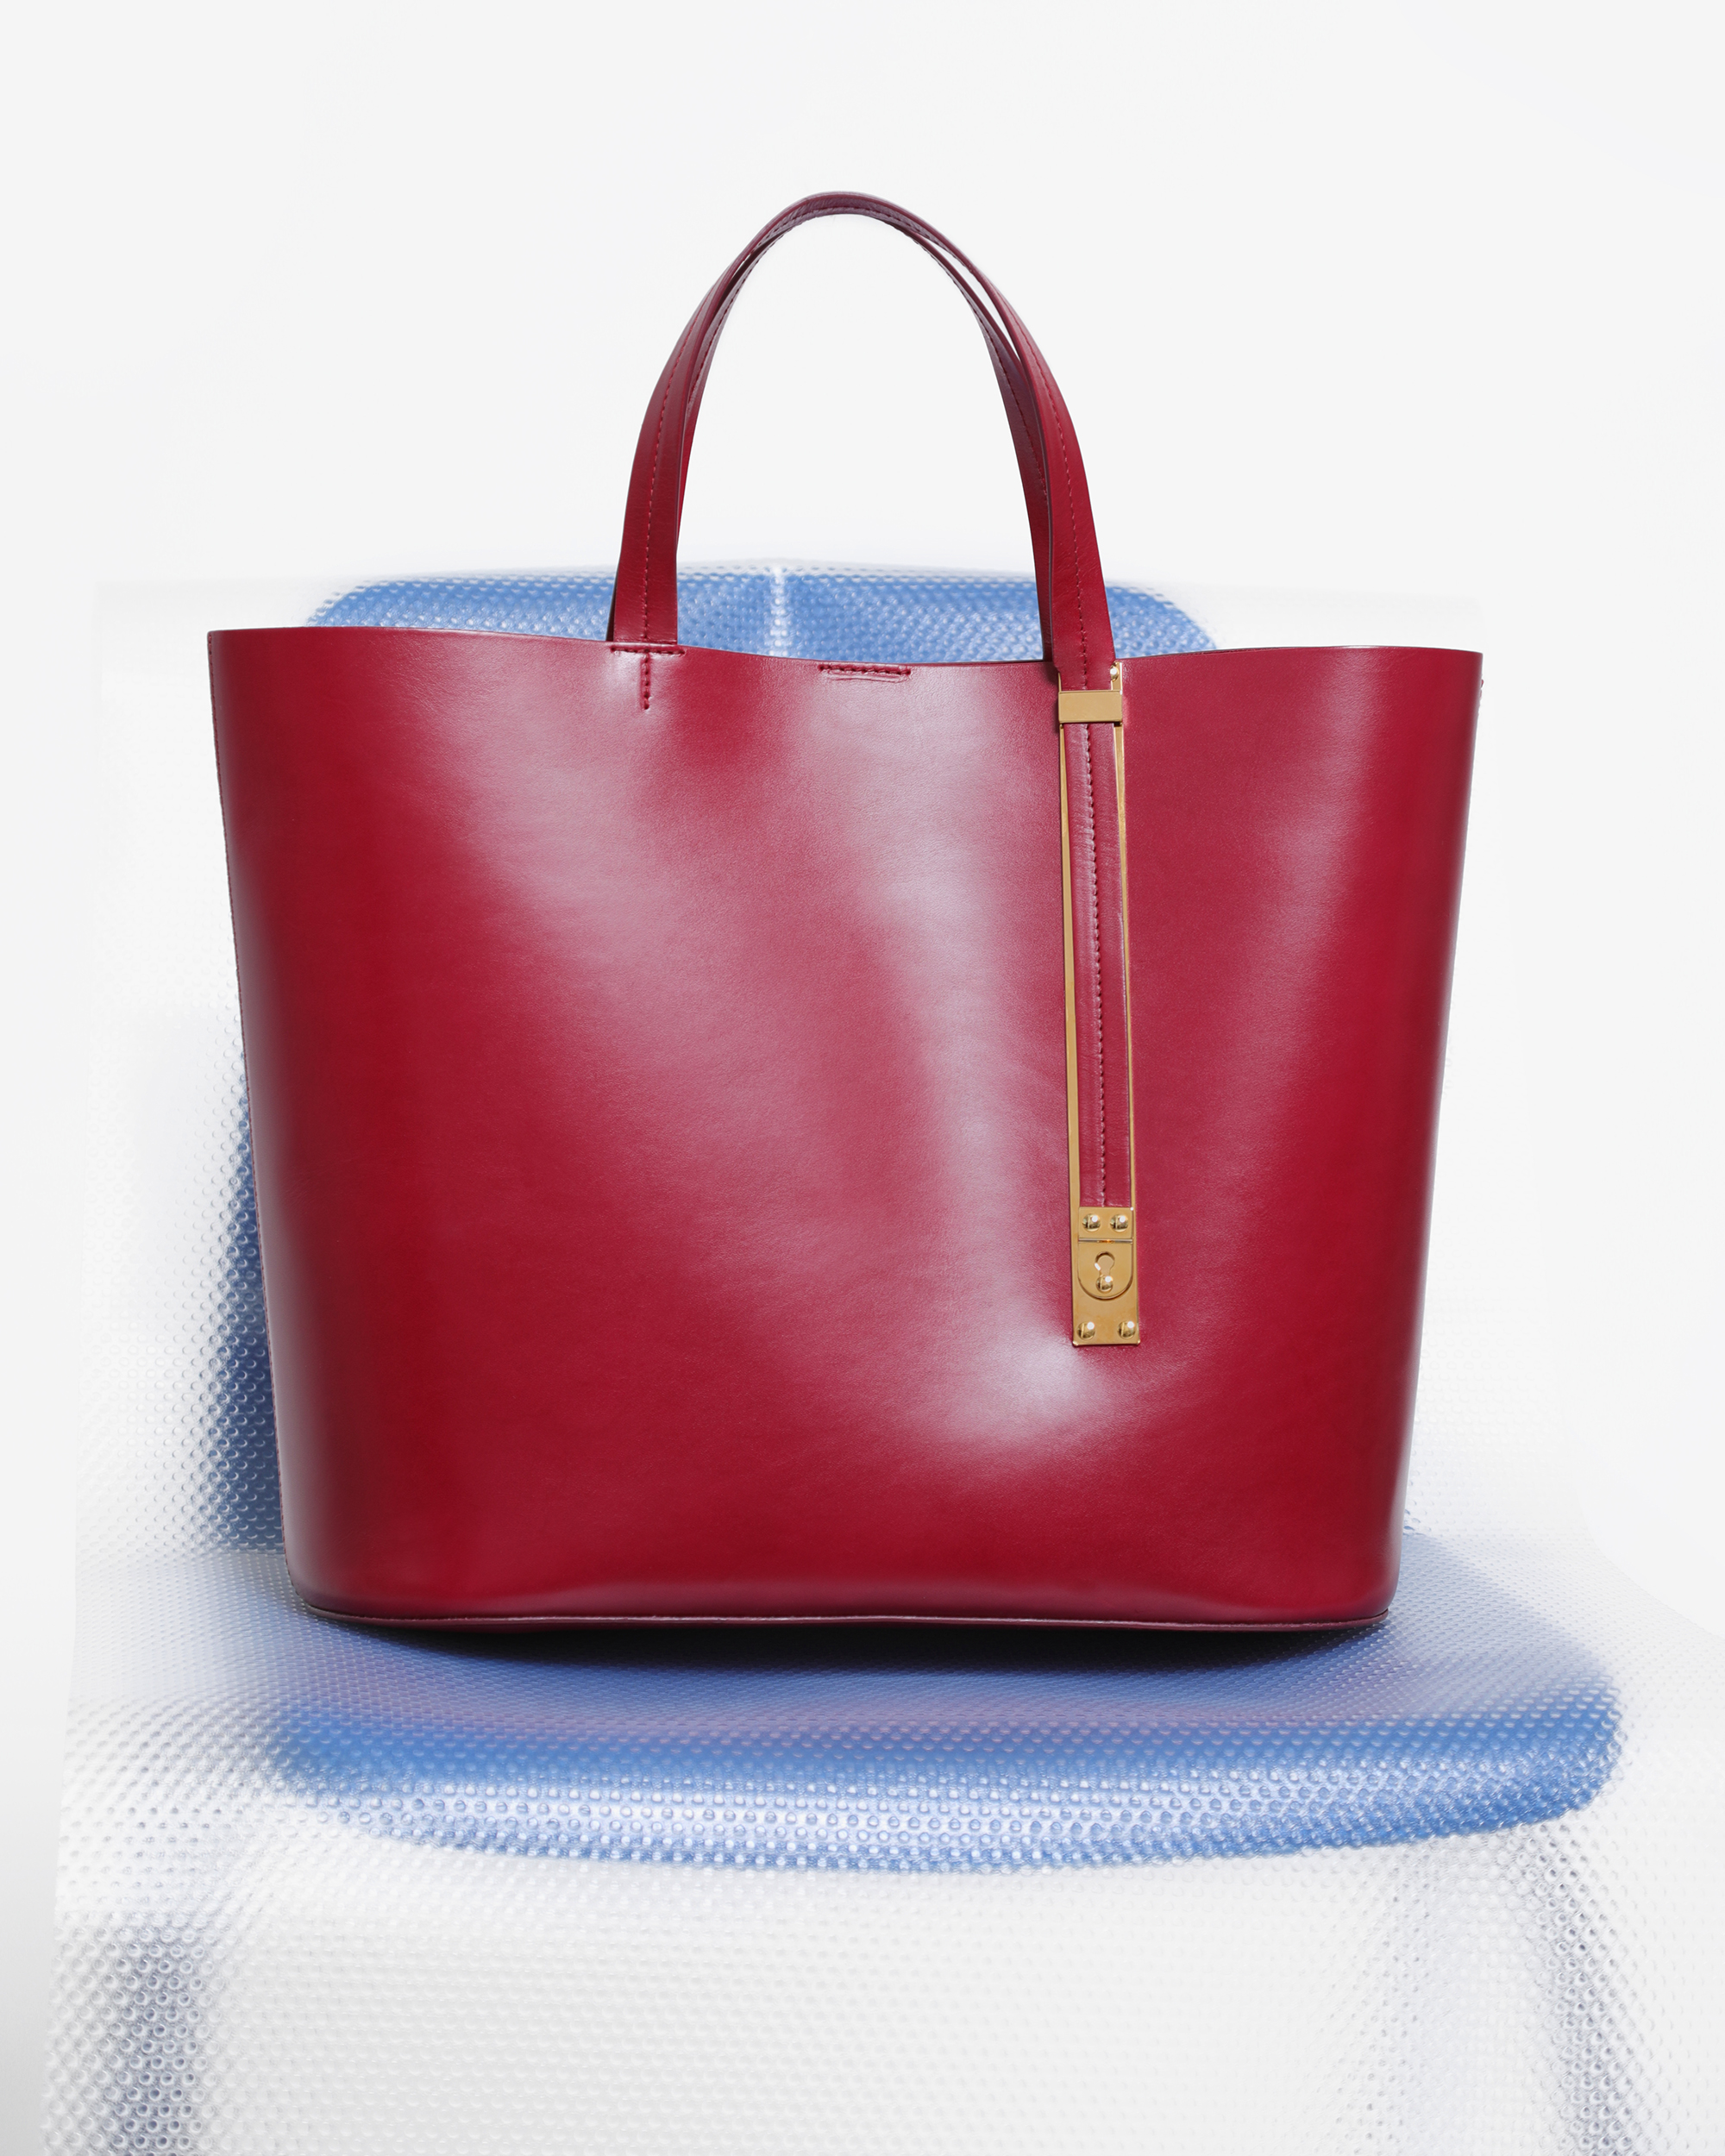 Raspberry handbag